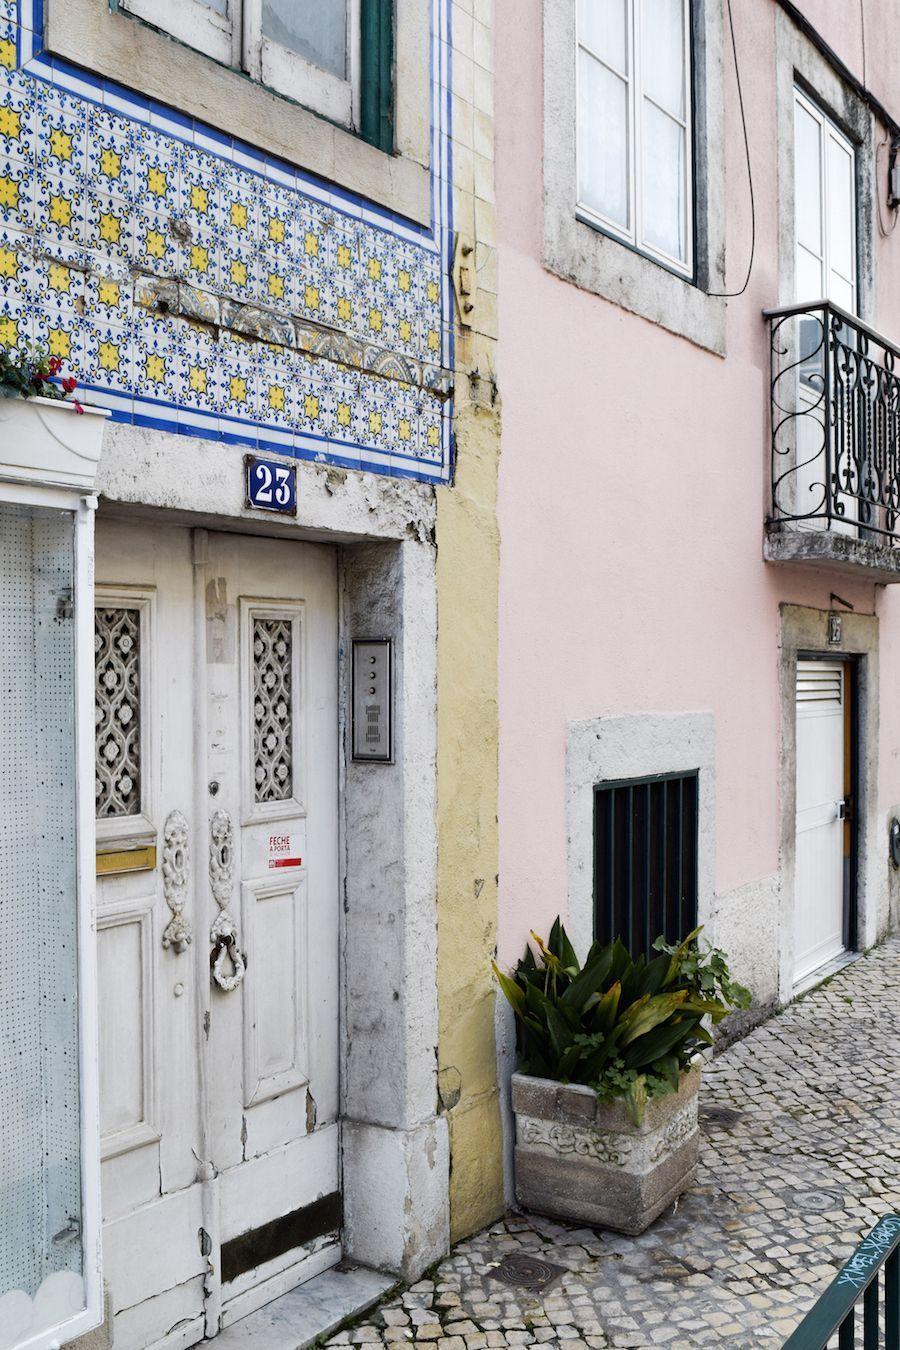 East of Lisbon, Portugal